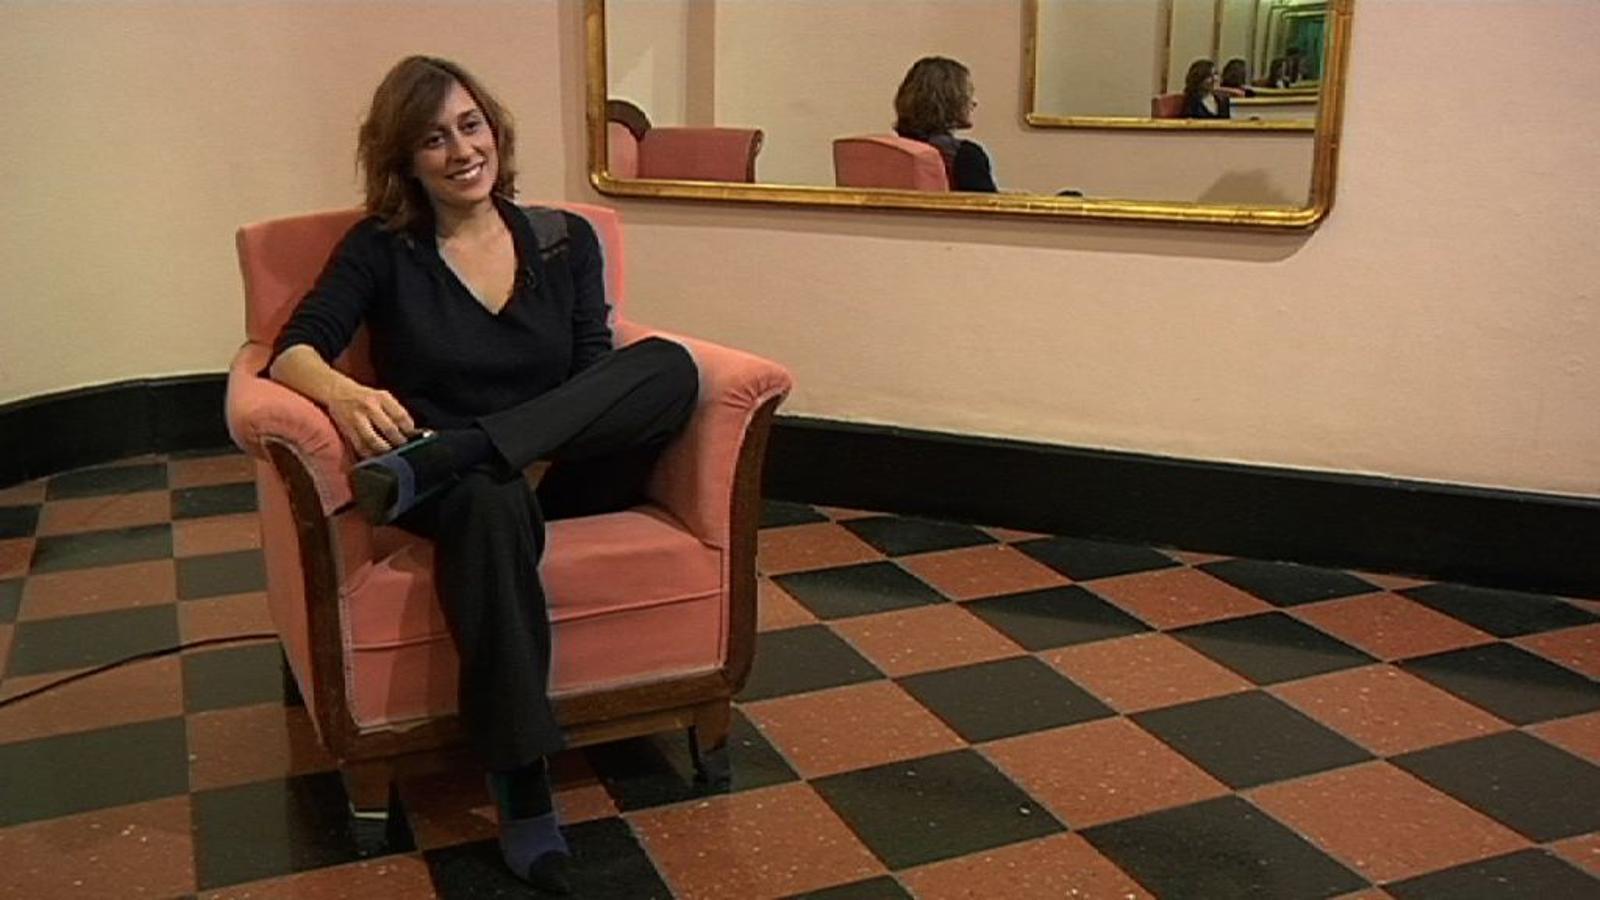 Entrevista completa a Clara Segura, per Carles Capdevila